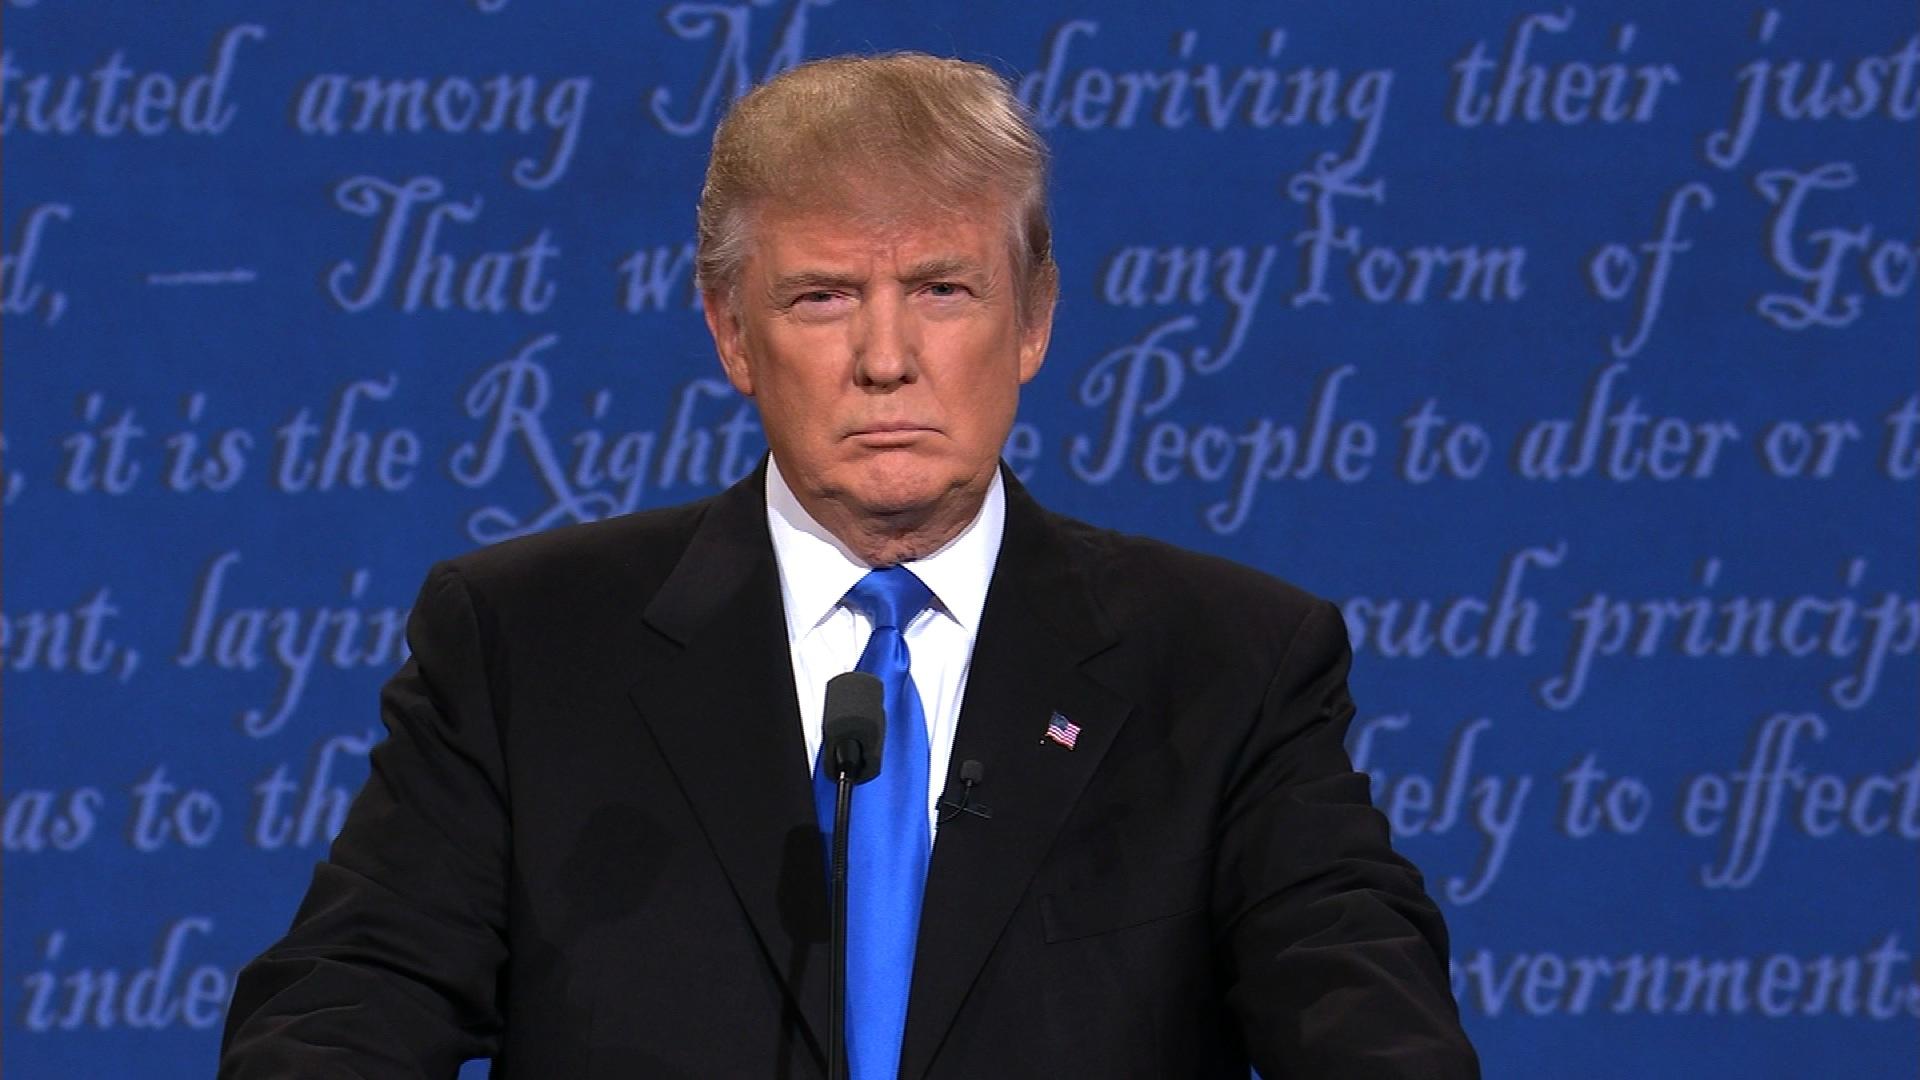 Trump and clinton spar over nafta cnn video